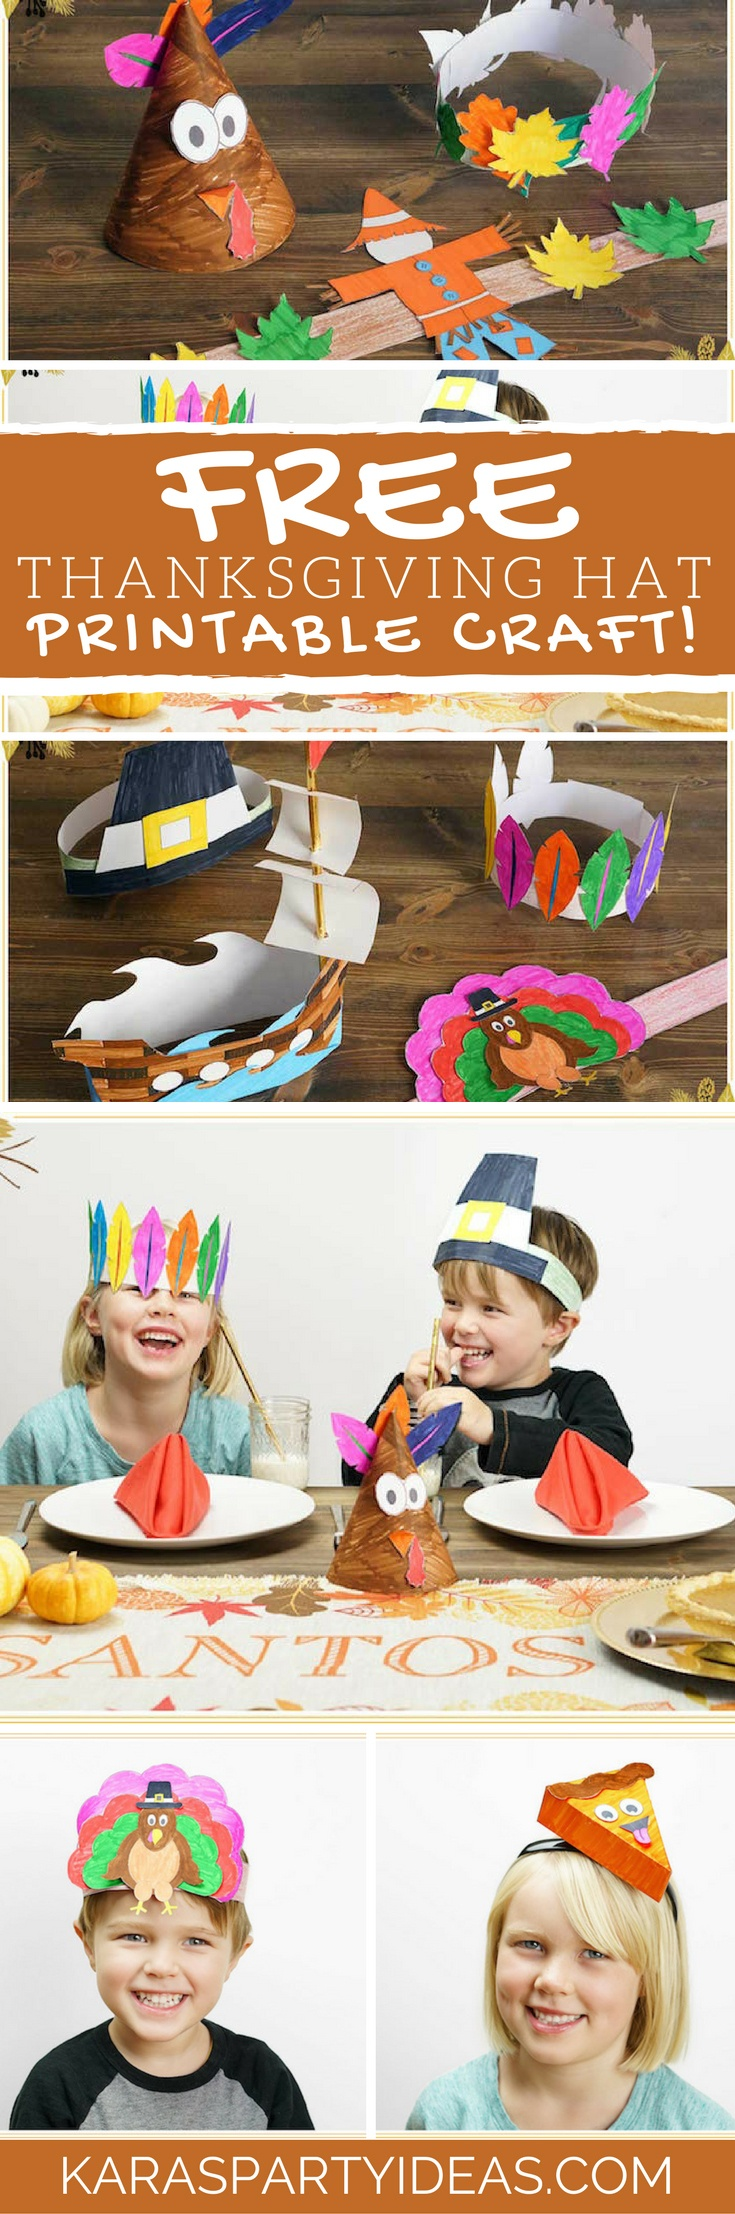 Kara's Party Ideas Free Thanksgiving Hat Printable Crafts   Kara's - Free Printable Thanksgiving Hats